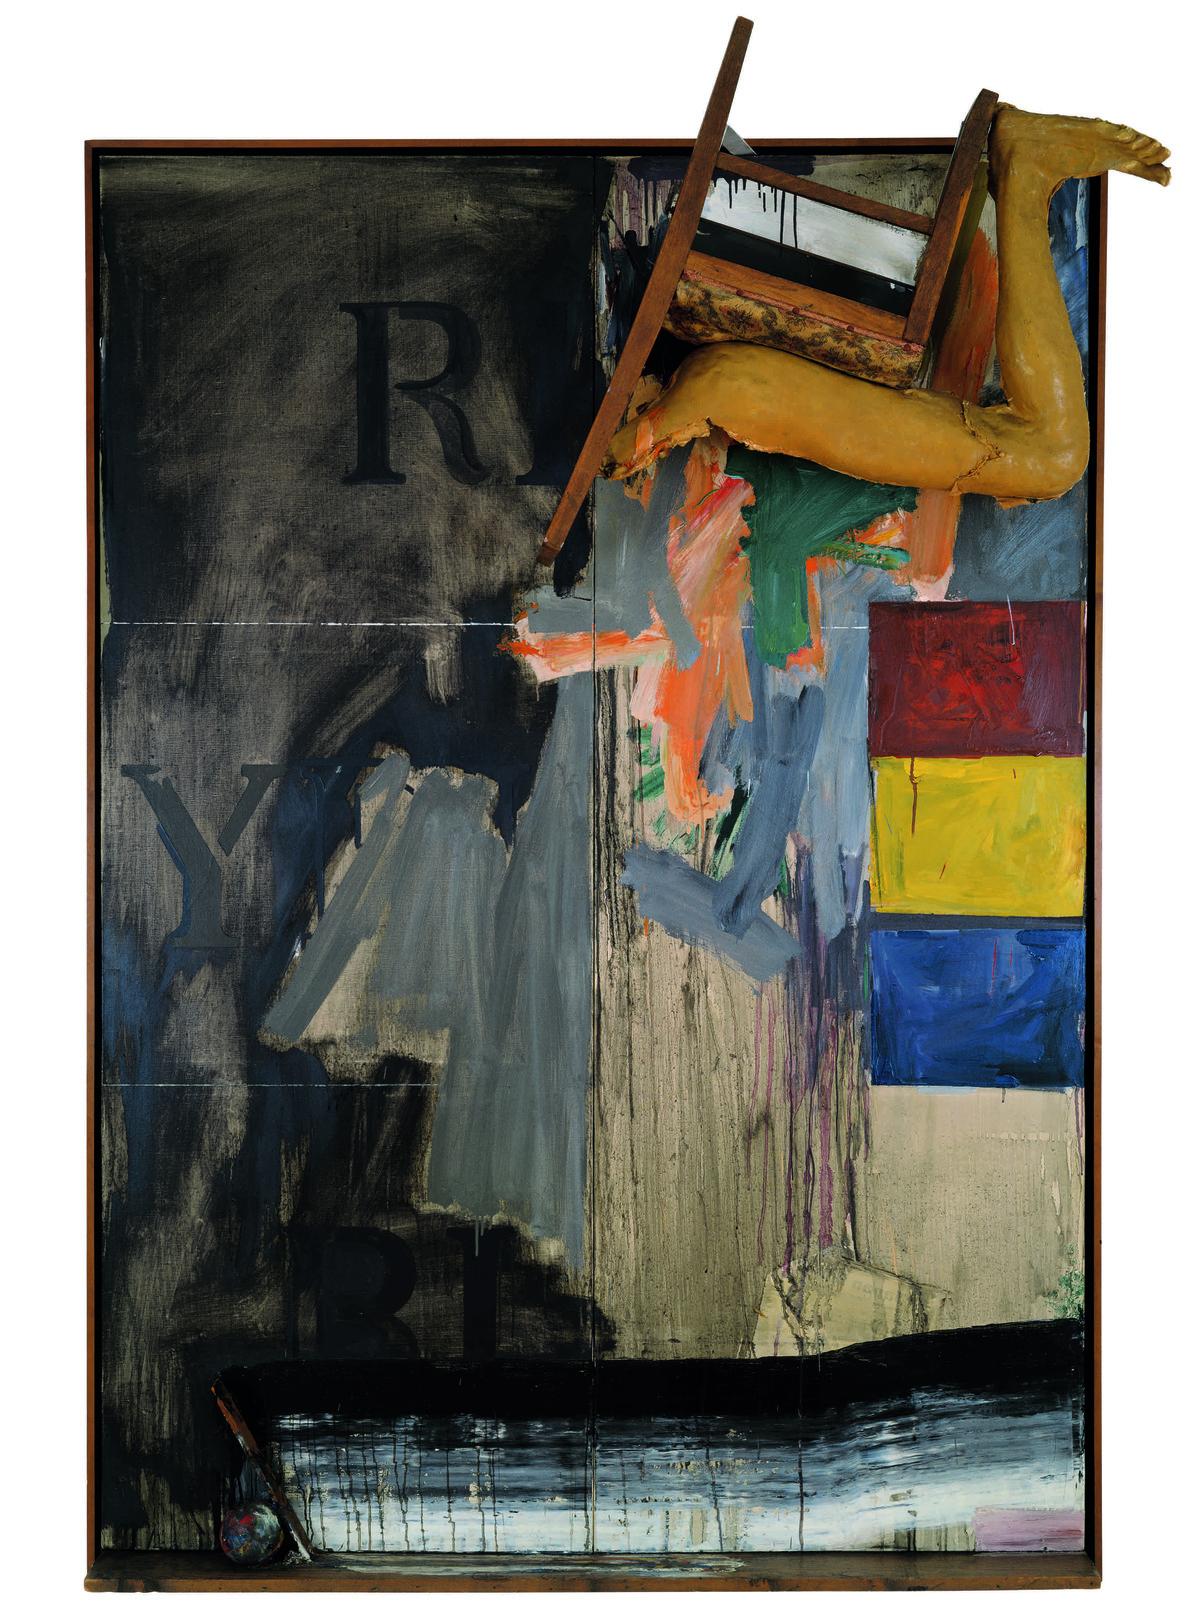 Jasper Johns, Watchman, 1964